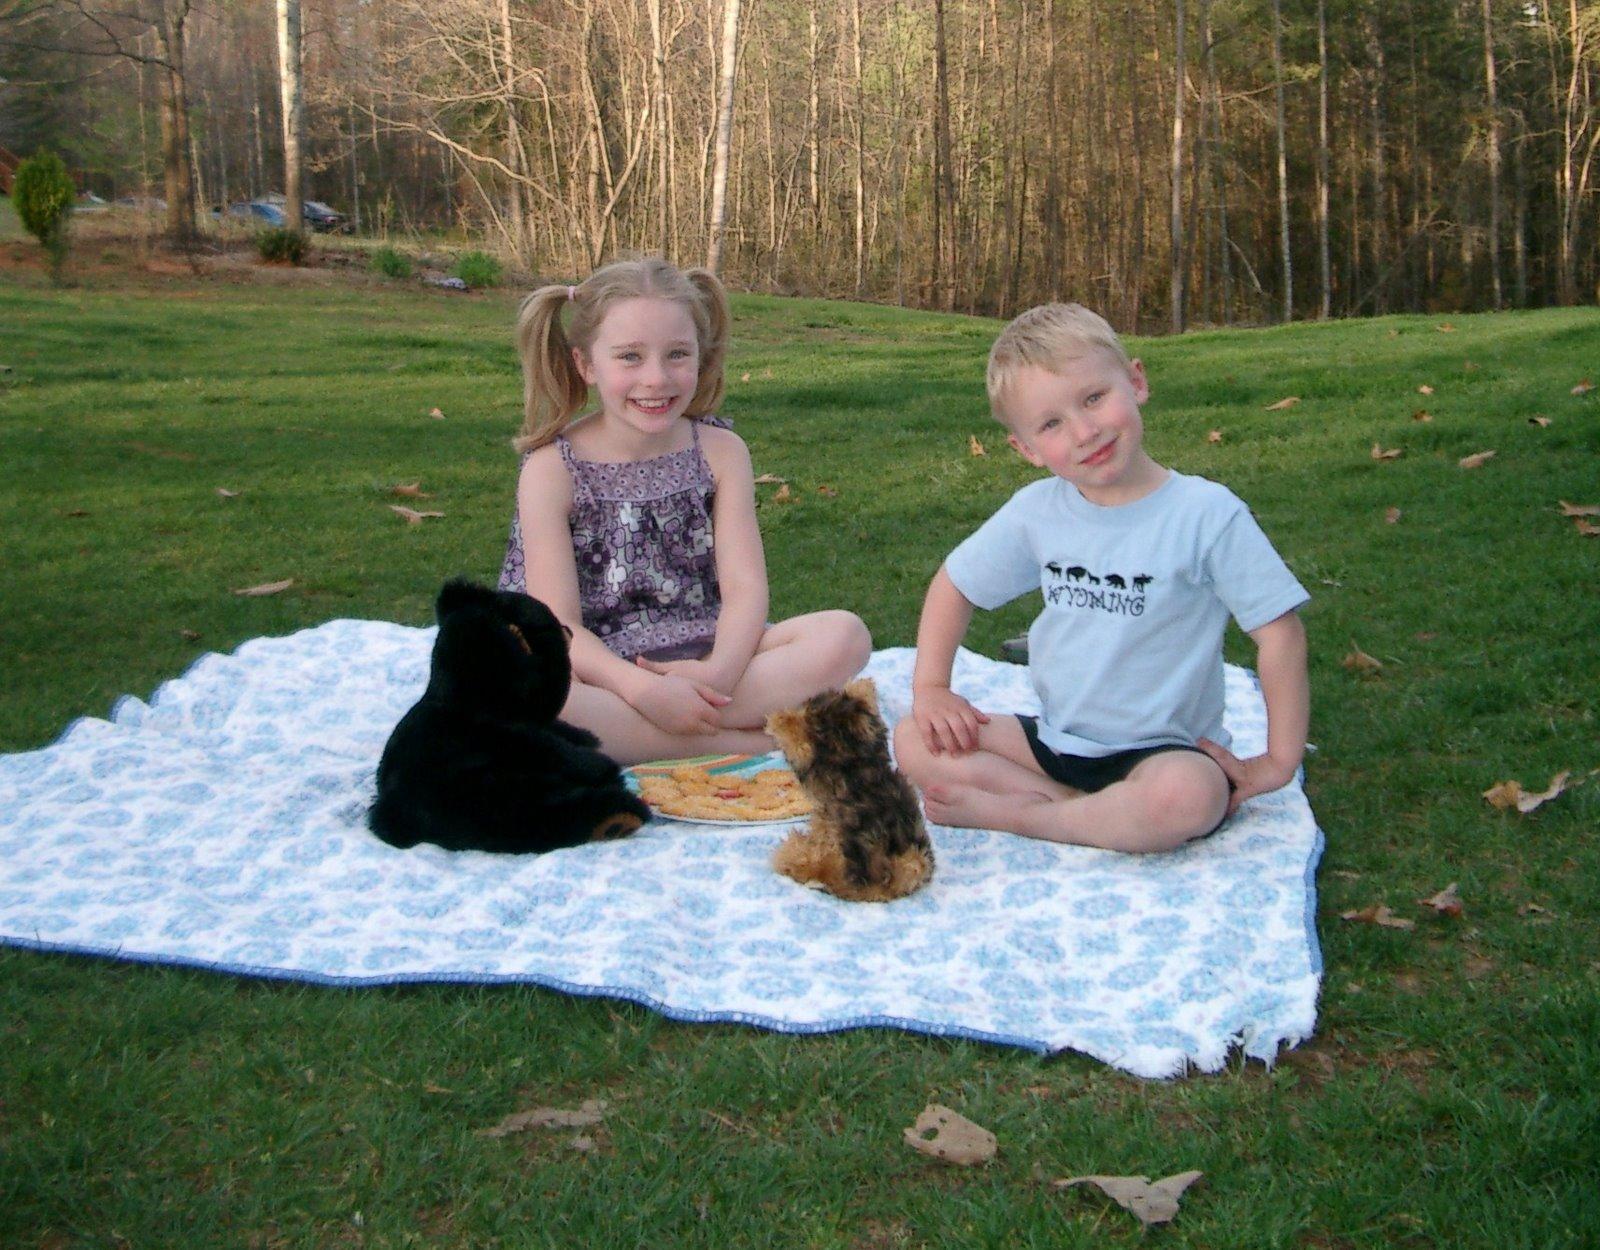 [picnic-ers.JPG]